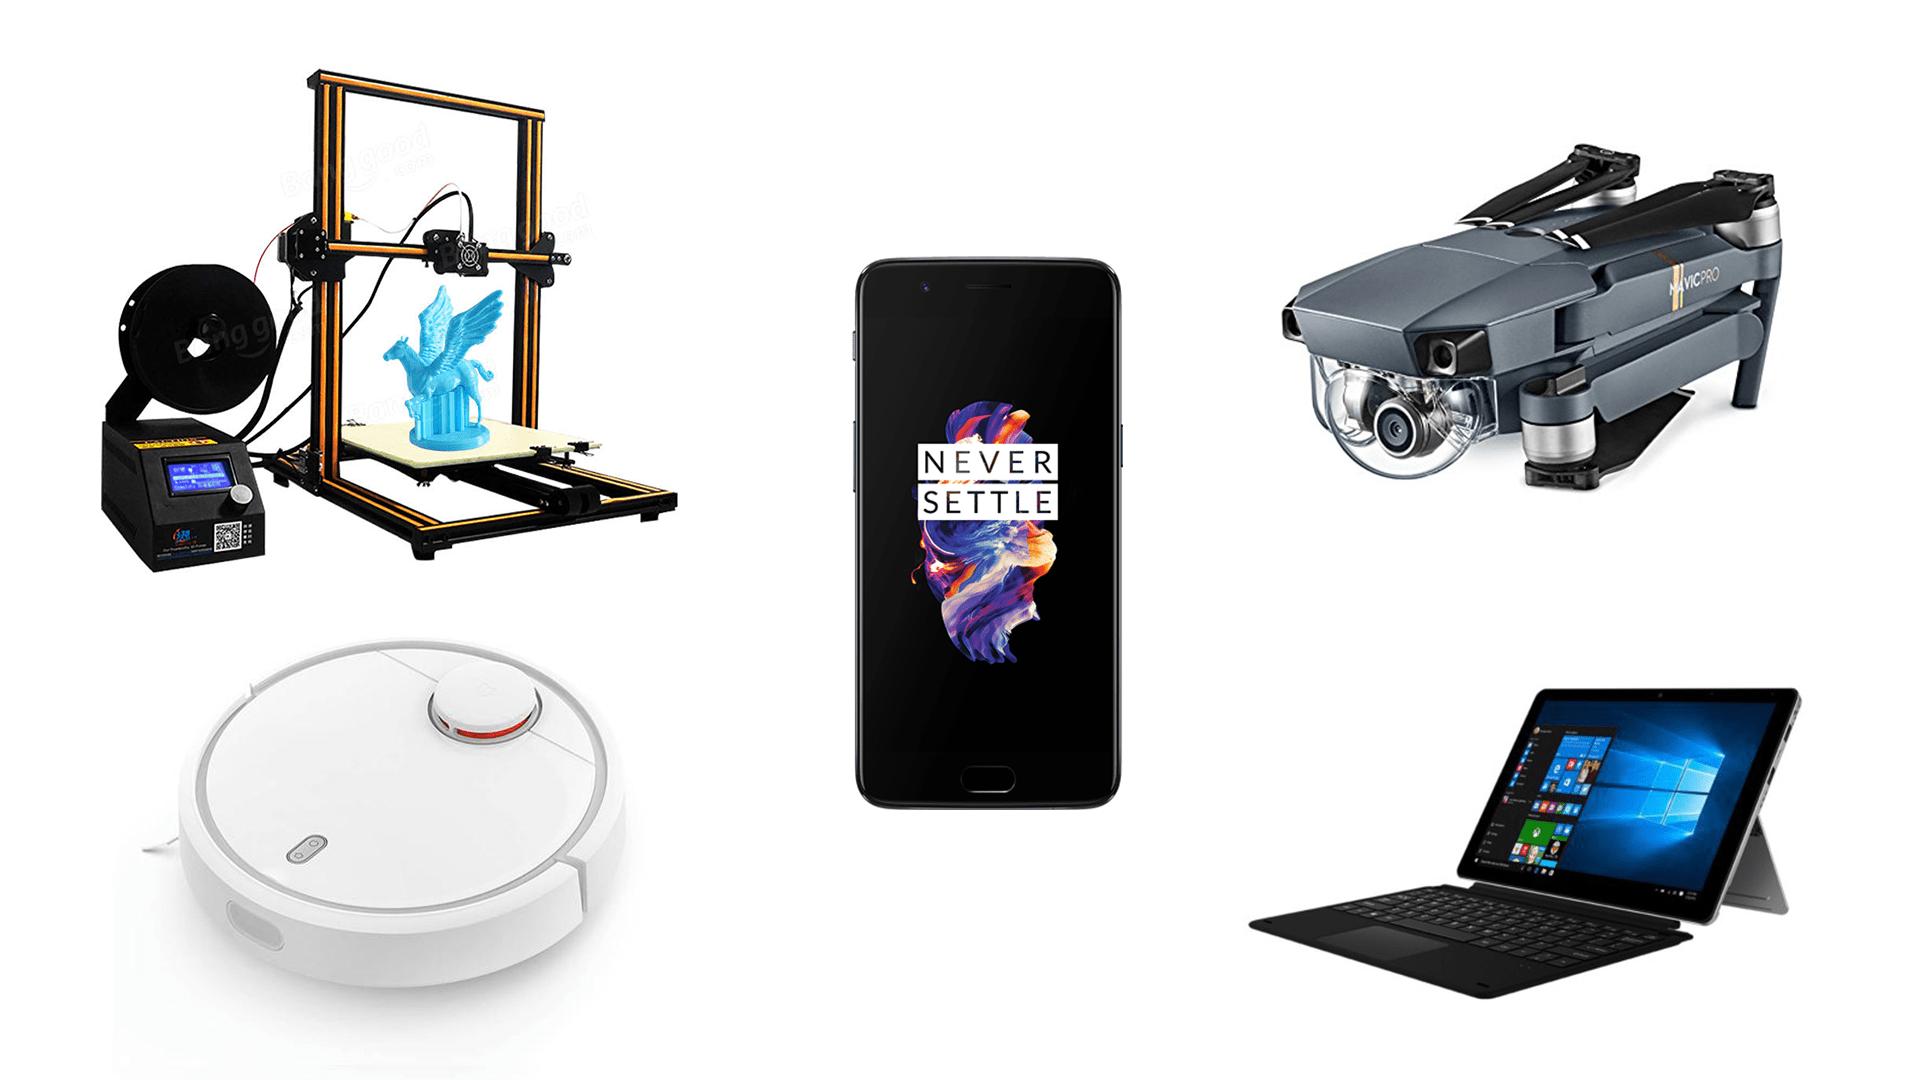 7 offres de la semaine sur GearBest : OnePlus 5, Xiaomi Mi Notebook Pro, DJI Mavic Pro, etc.